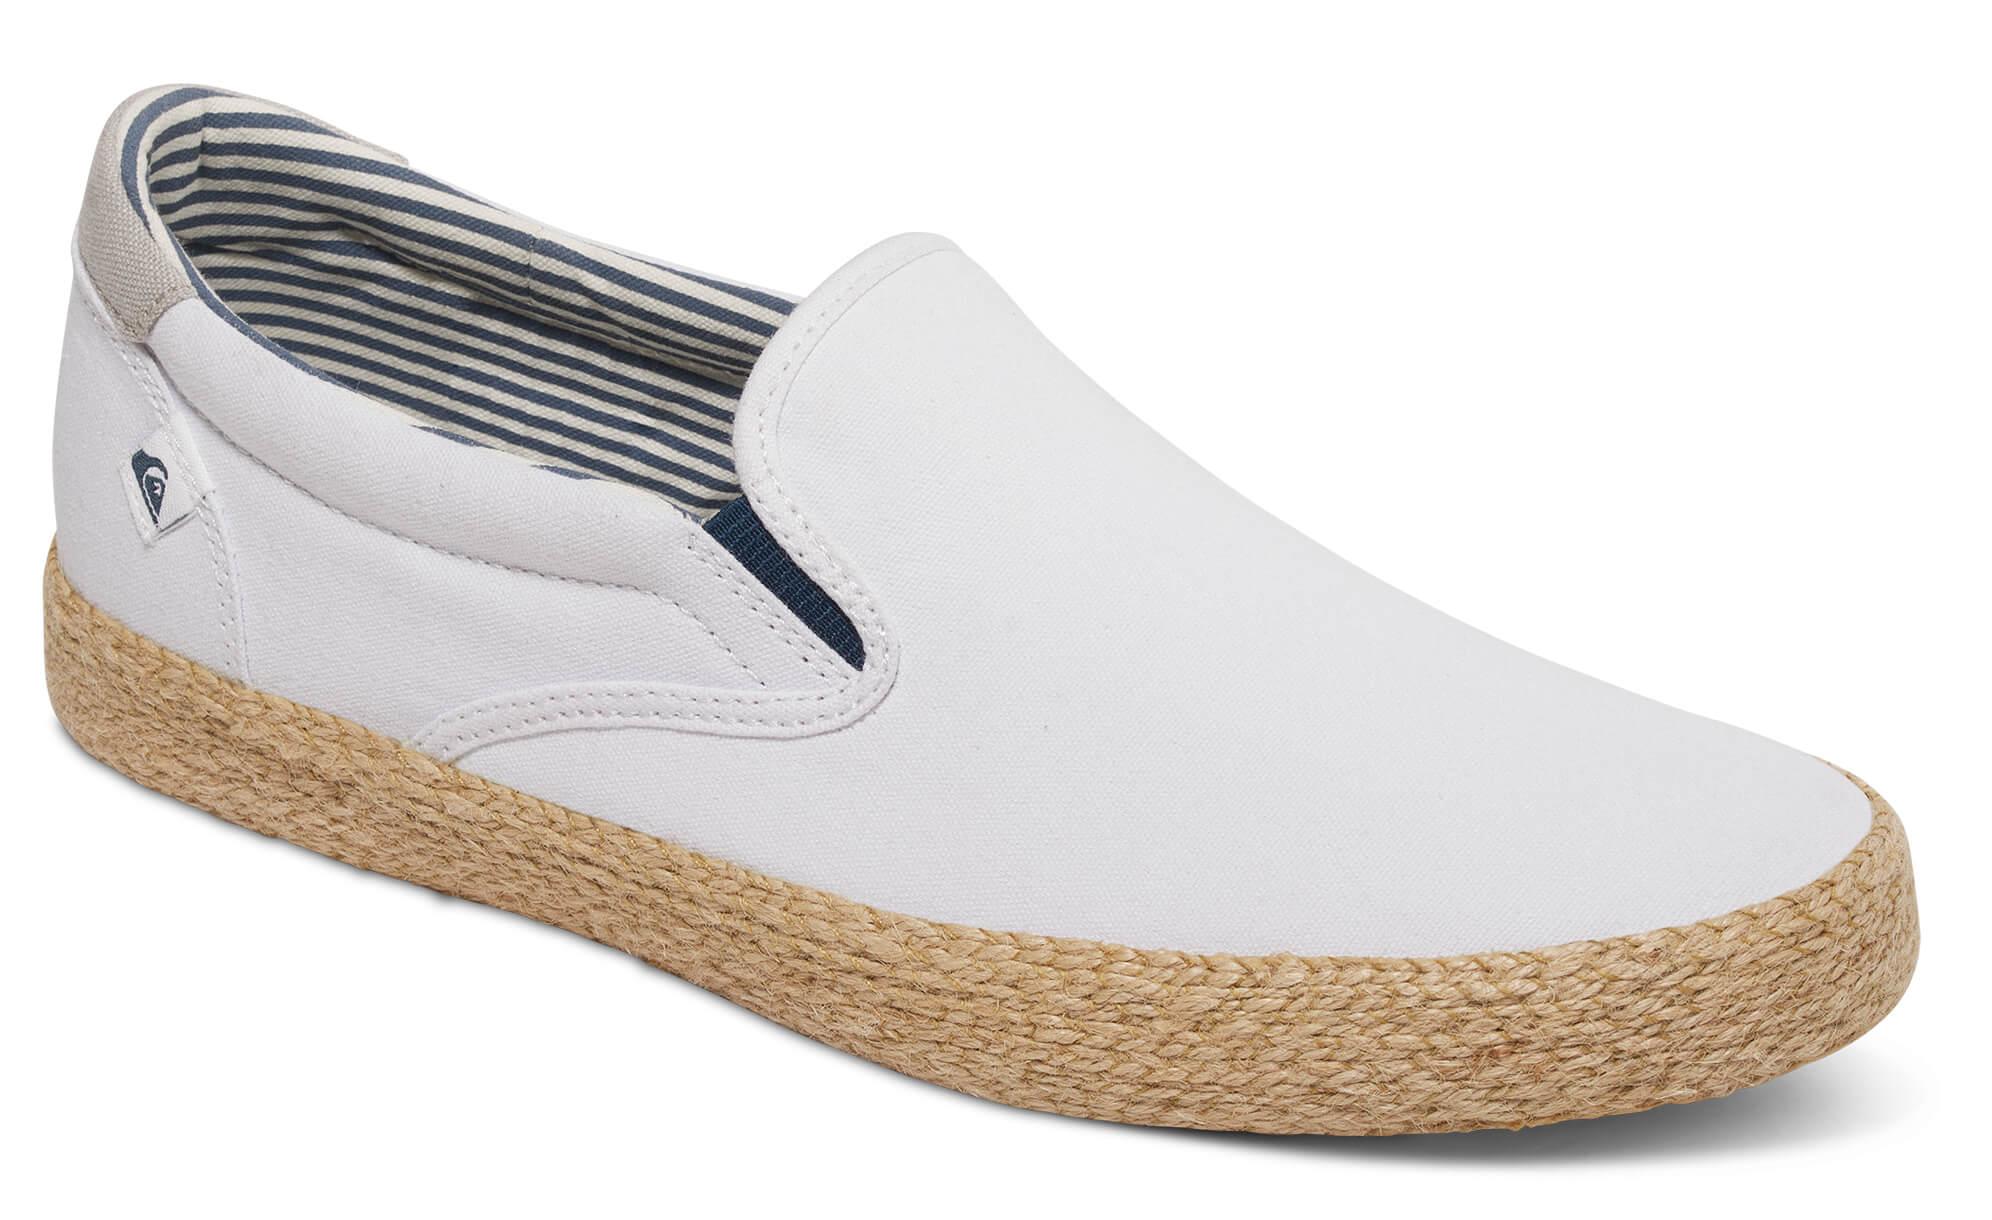 Quiksilver Pánské tenisky Shorebreak Slip-on Esp White White Brown  AQYS300056-XWWC 5911a5b59a